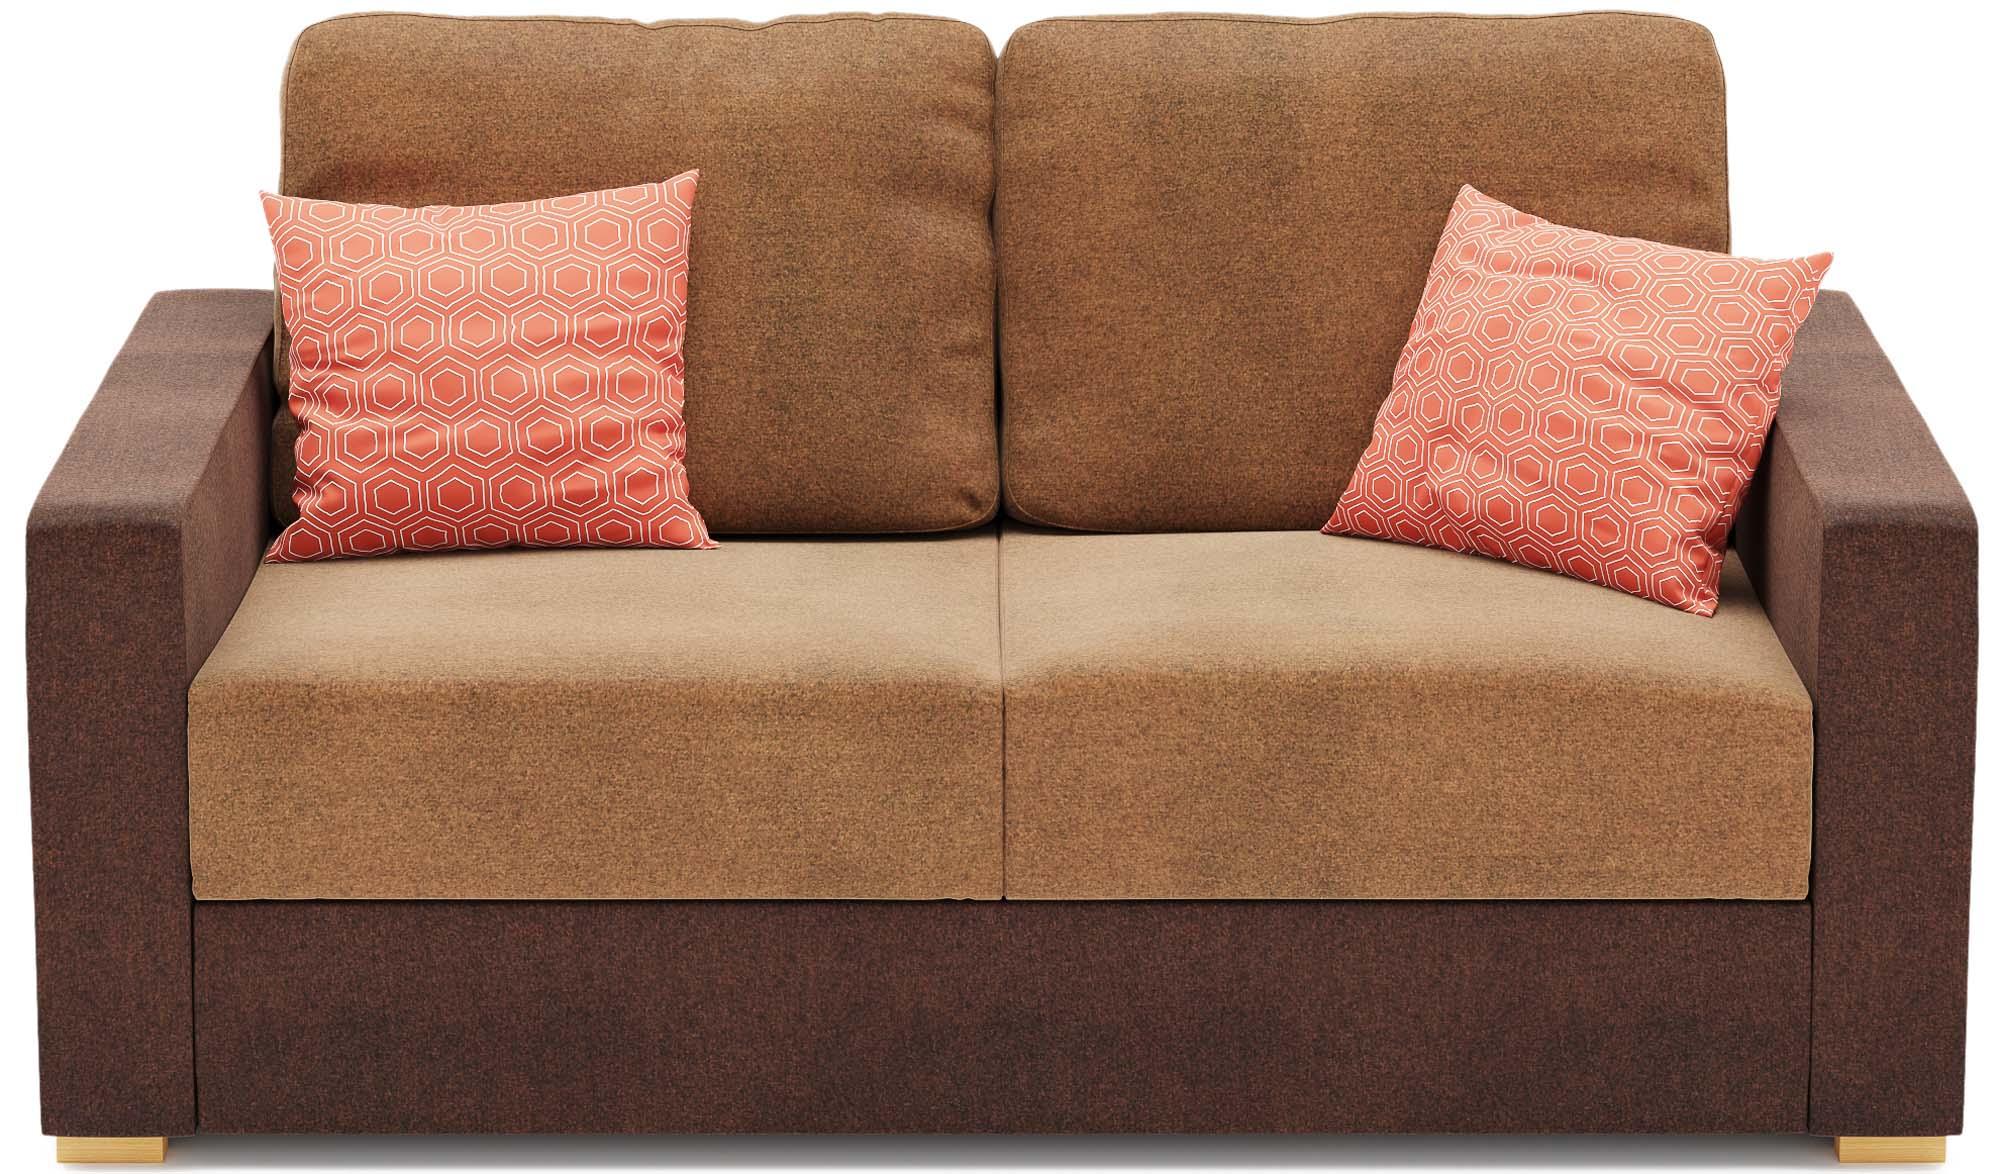 Alda Small 2 Seat Double Sofa Bed Nabru